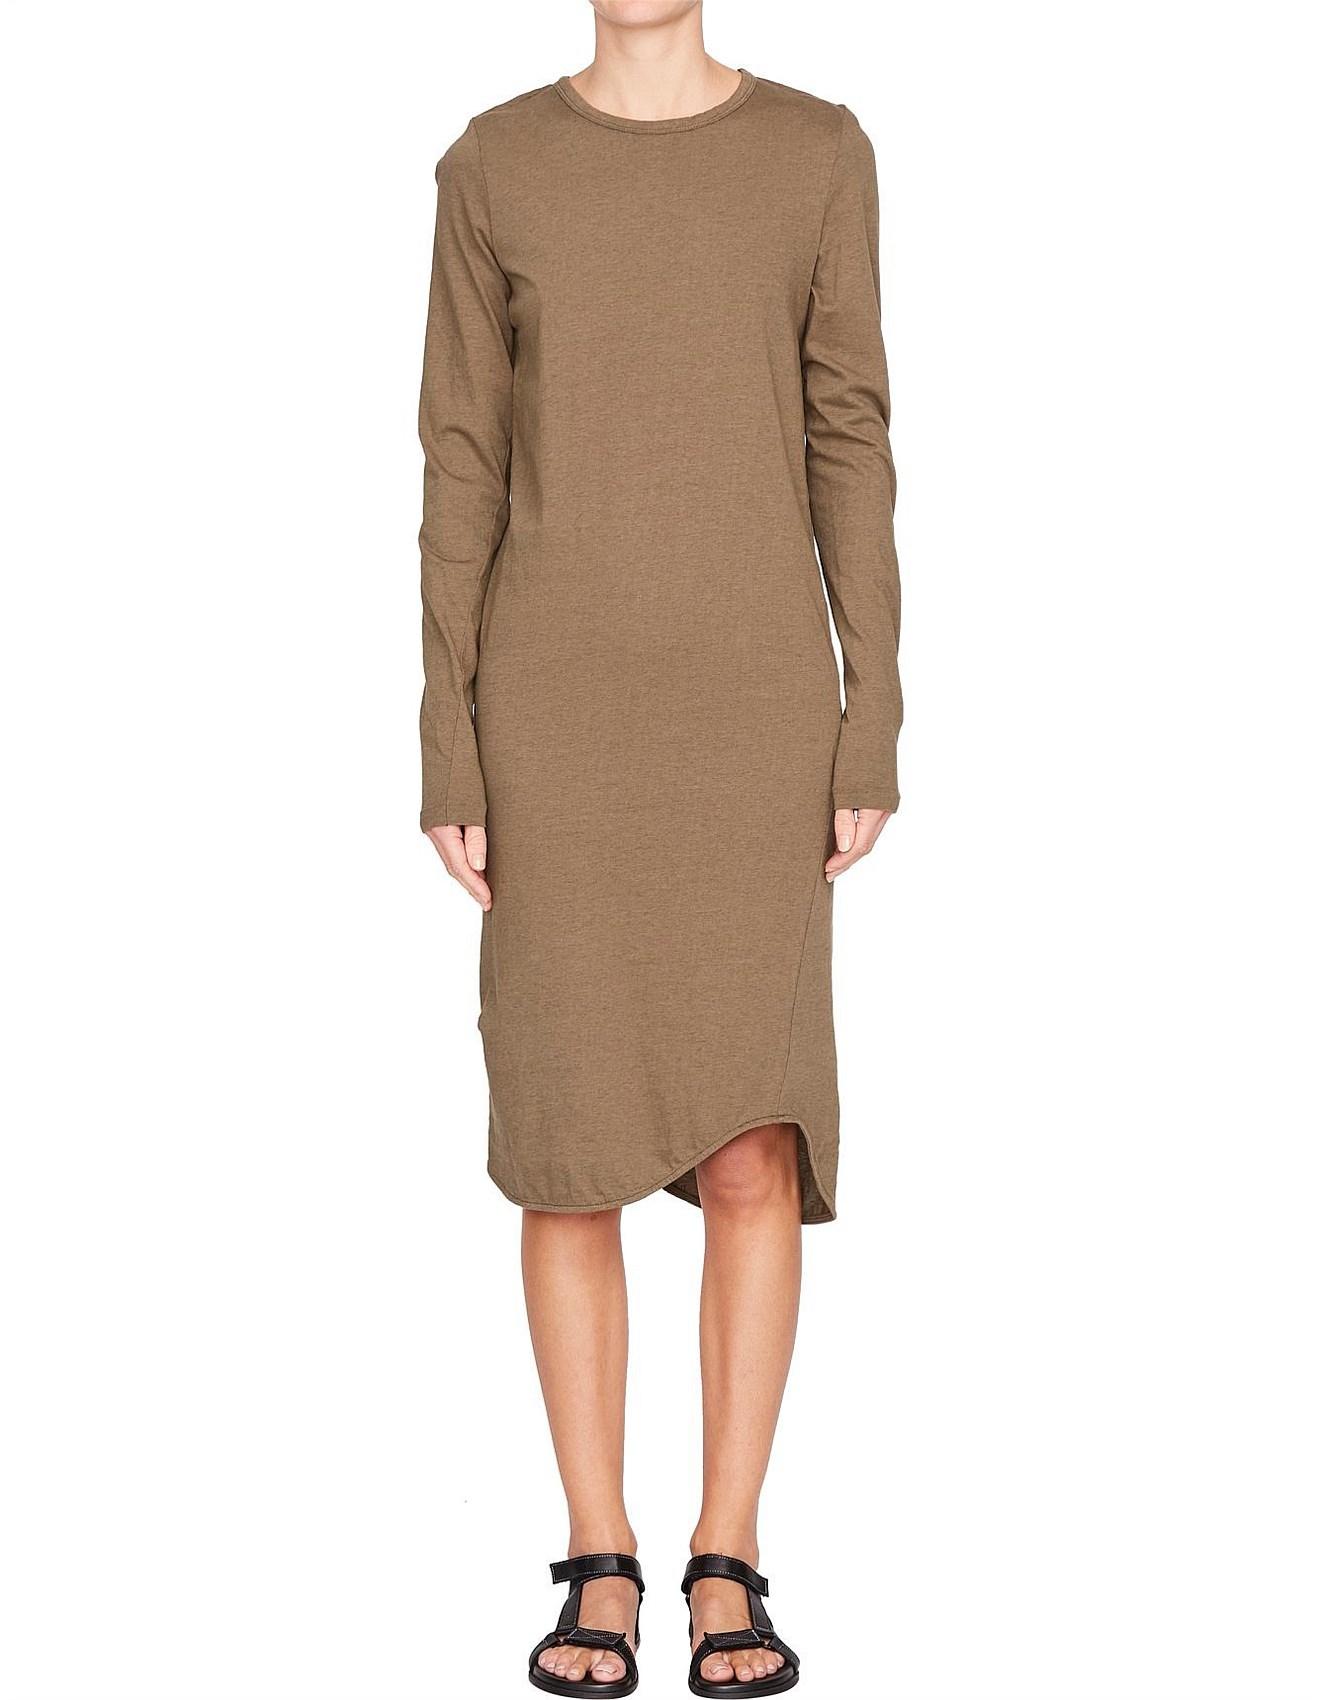 350818155f84 French Seam Long Sleeve T.Shirt Dress